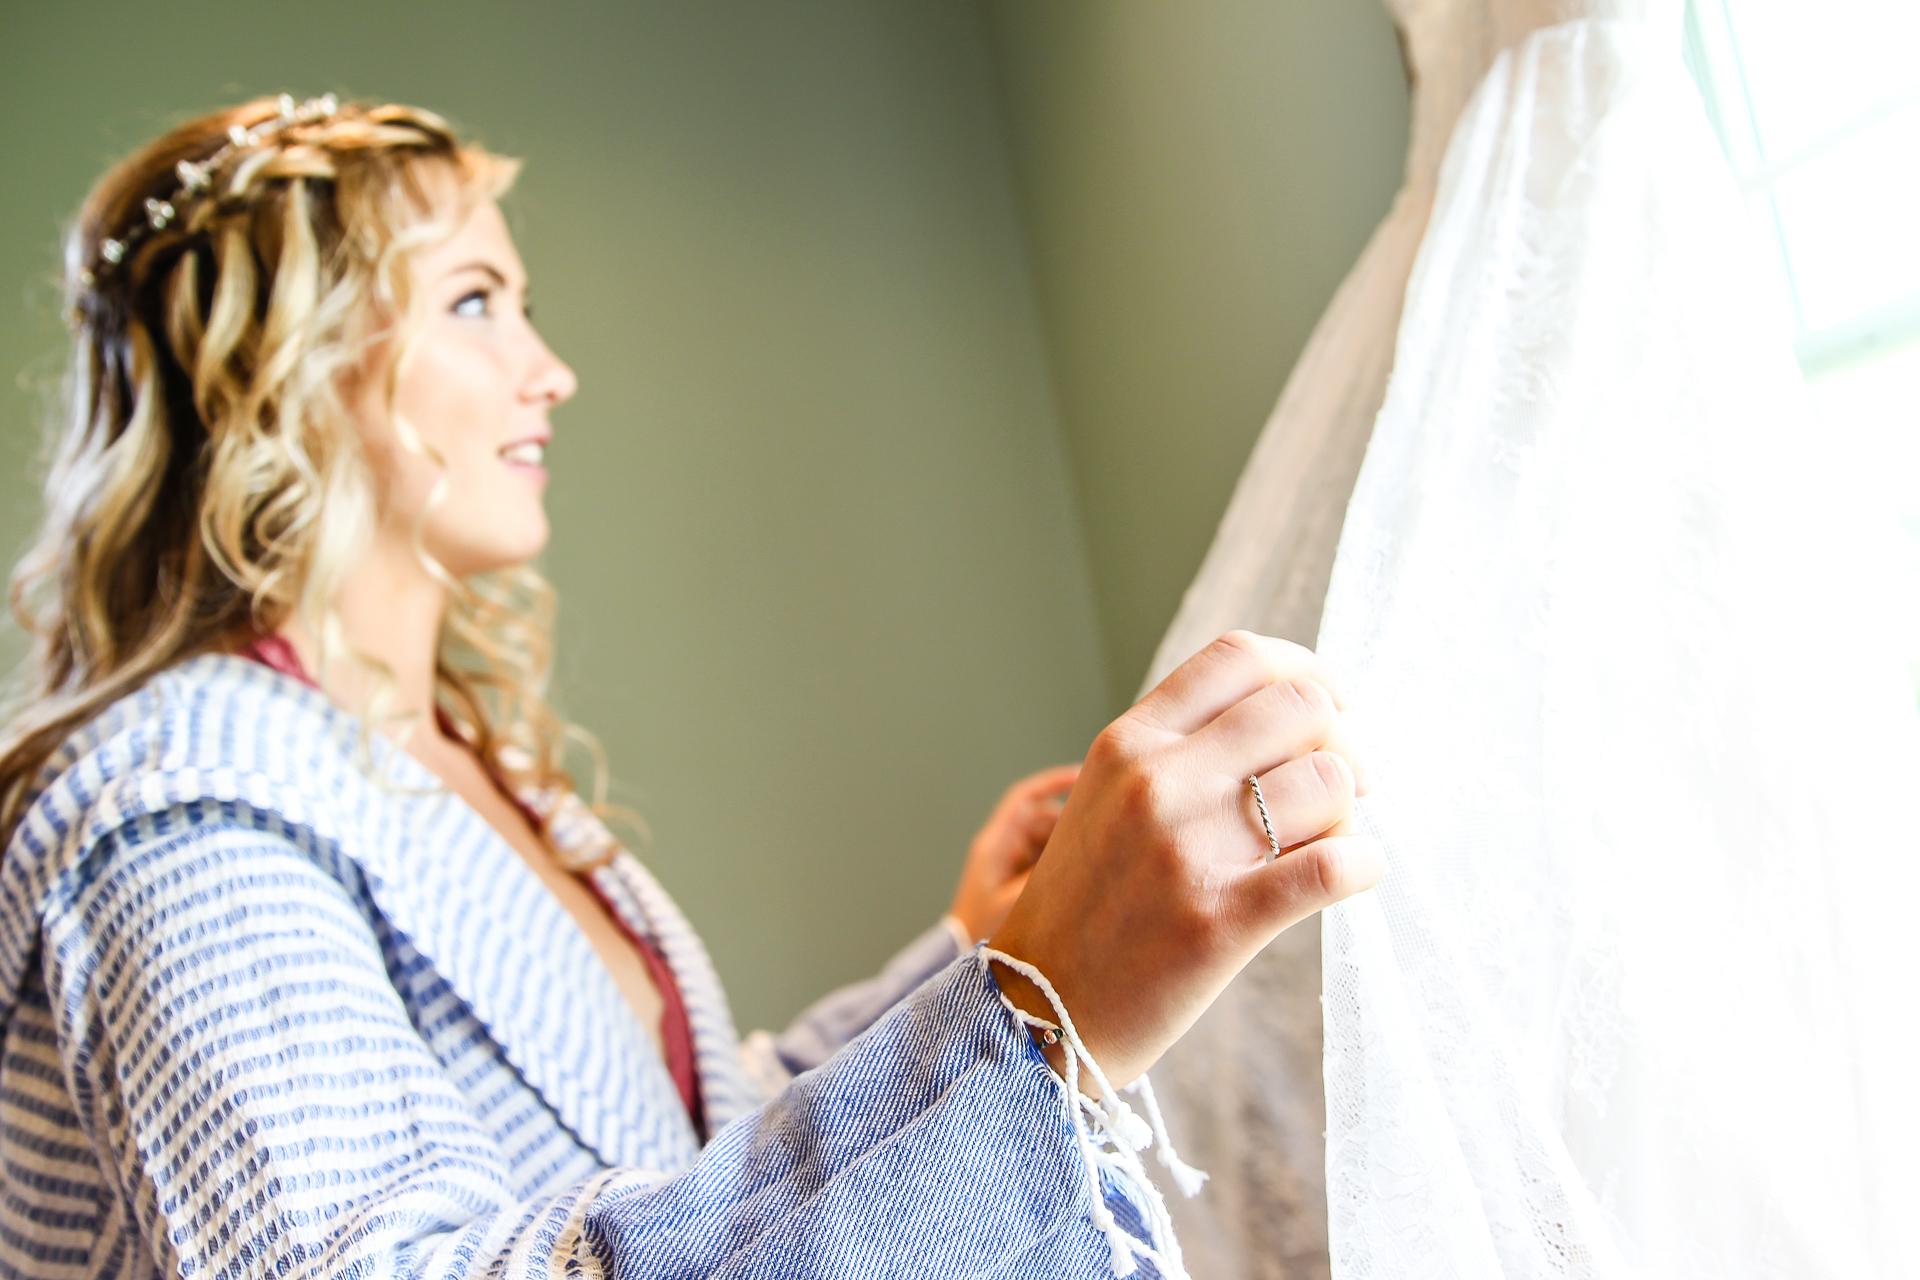 Jordan + Kevin Wedding On Sunny Slope Farm Wedding Venue by Linda Hexter Photography (4 of 30)